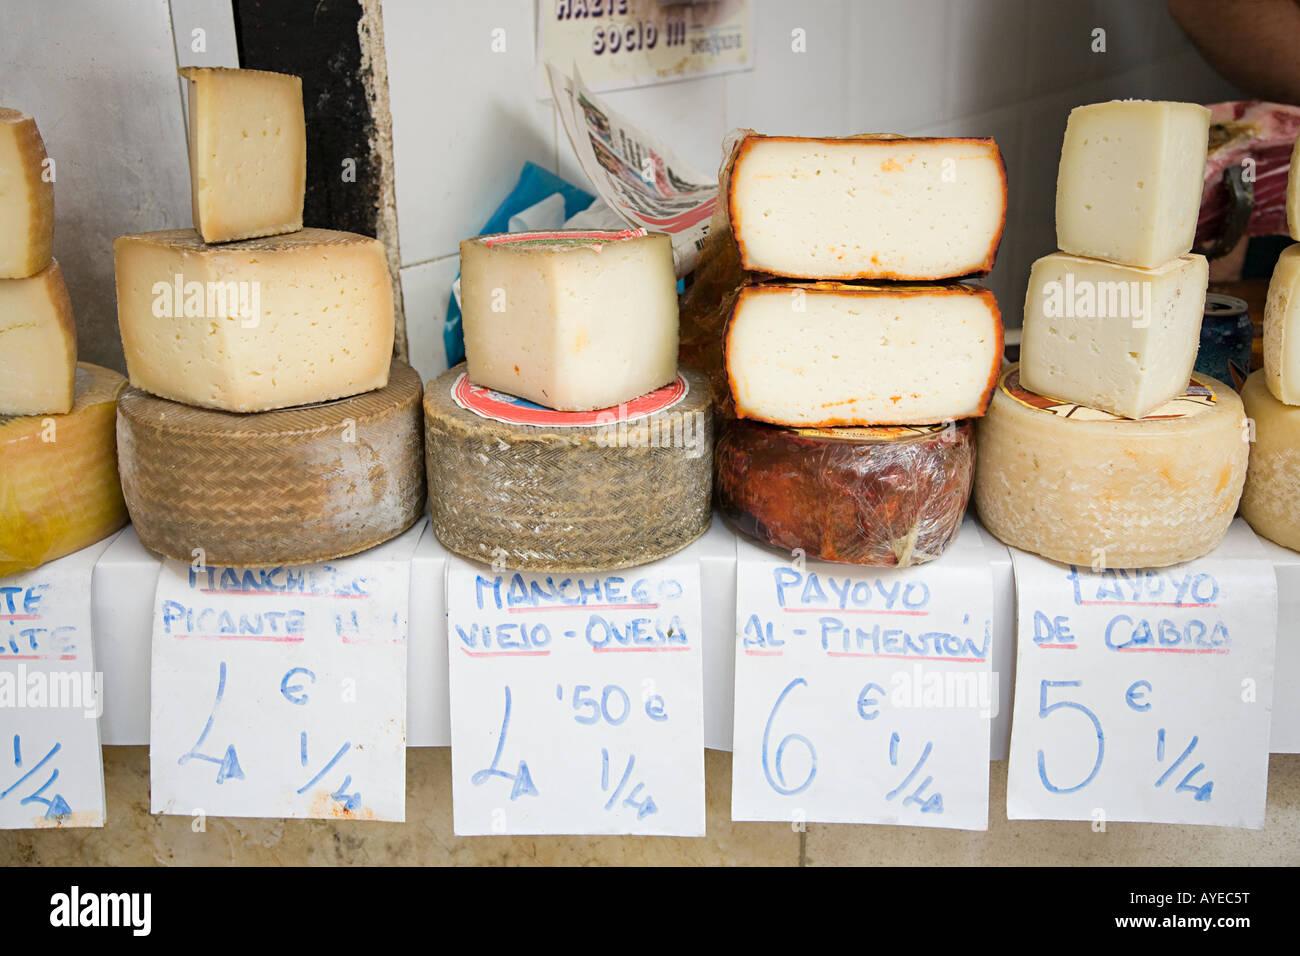 Käse auf einem Marktstand Stockbild